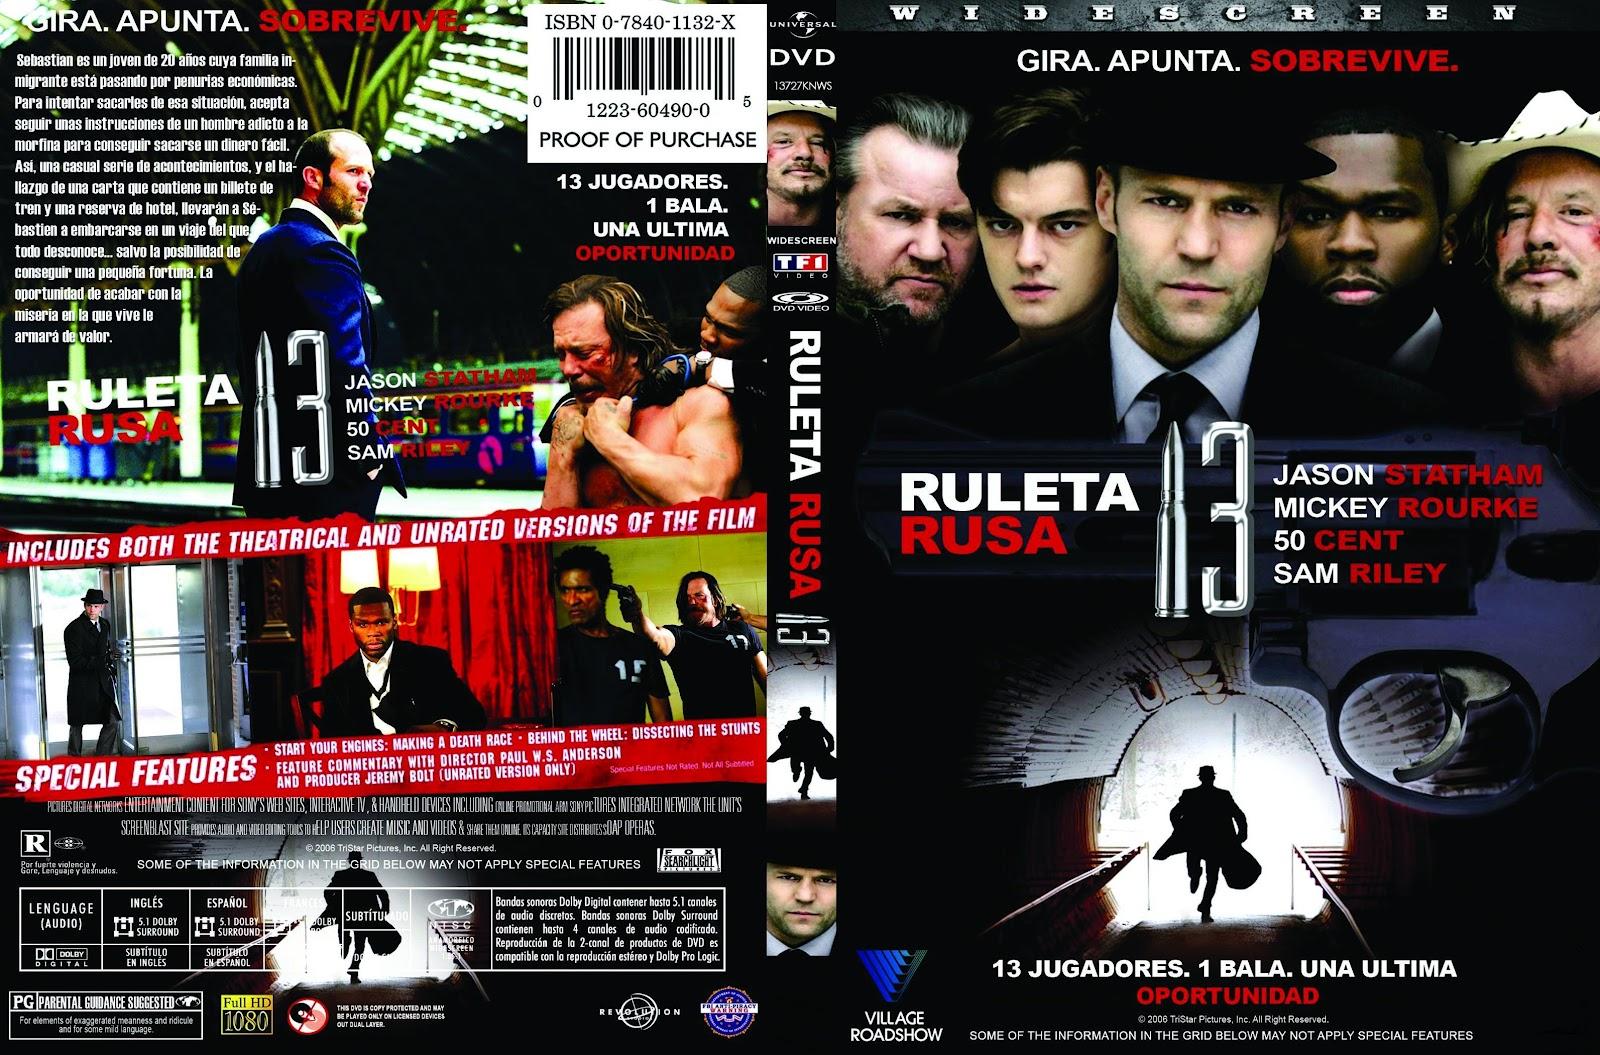 http://1.bp.blogspot.com/-4xyC0KG2Z24/UAXtEsS63vI/AAAAAAAAC0w/HQk_a8AoG1c/s1600/13_Ruleta_Rusa_-_Custom_por_haroldo_perez_%5Bdvd%5D_80.jpg